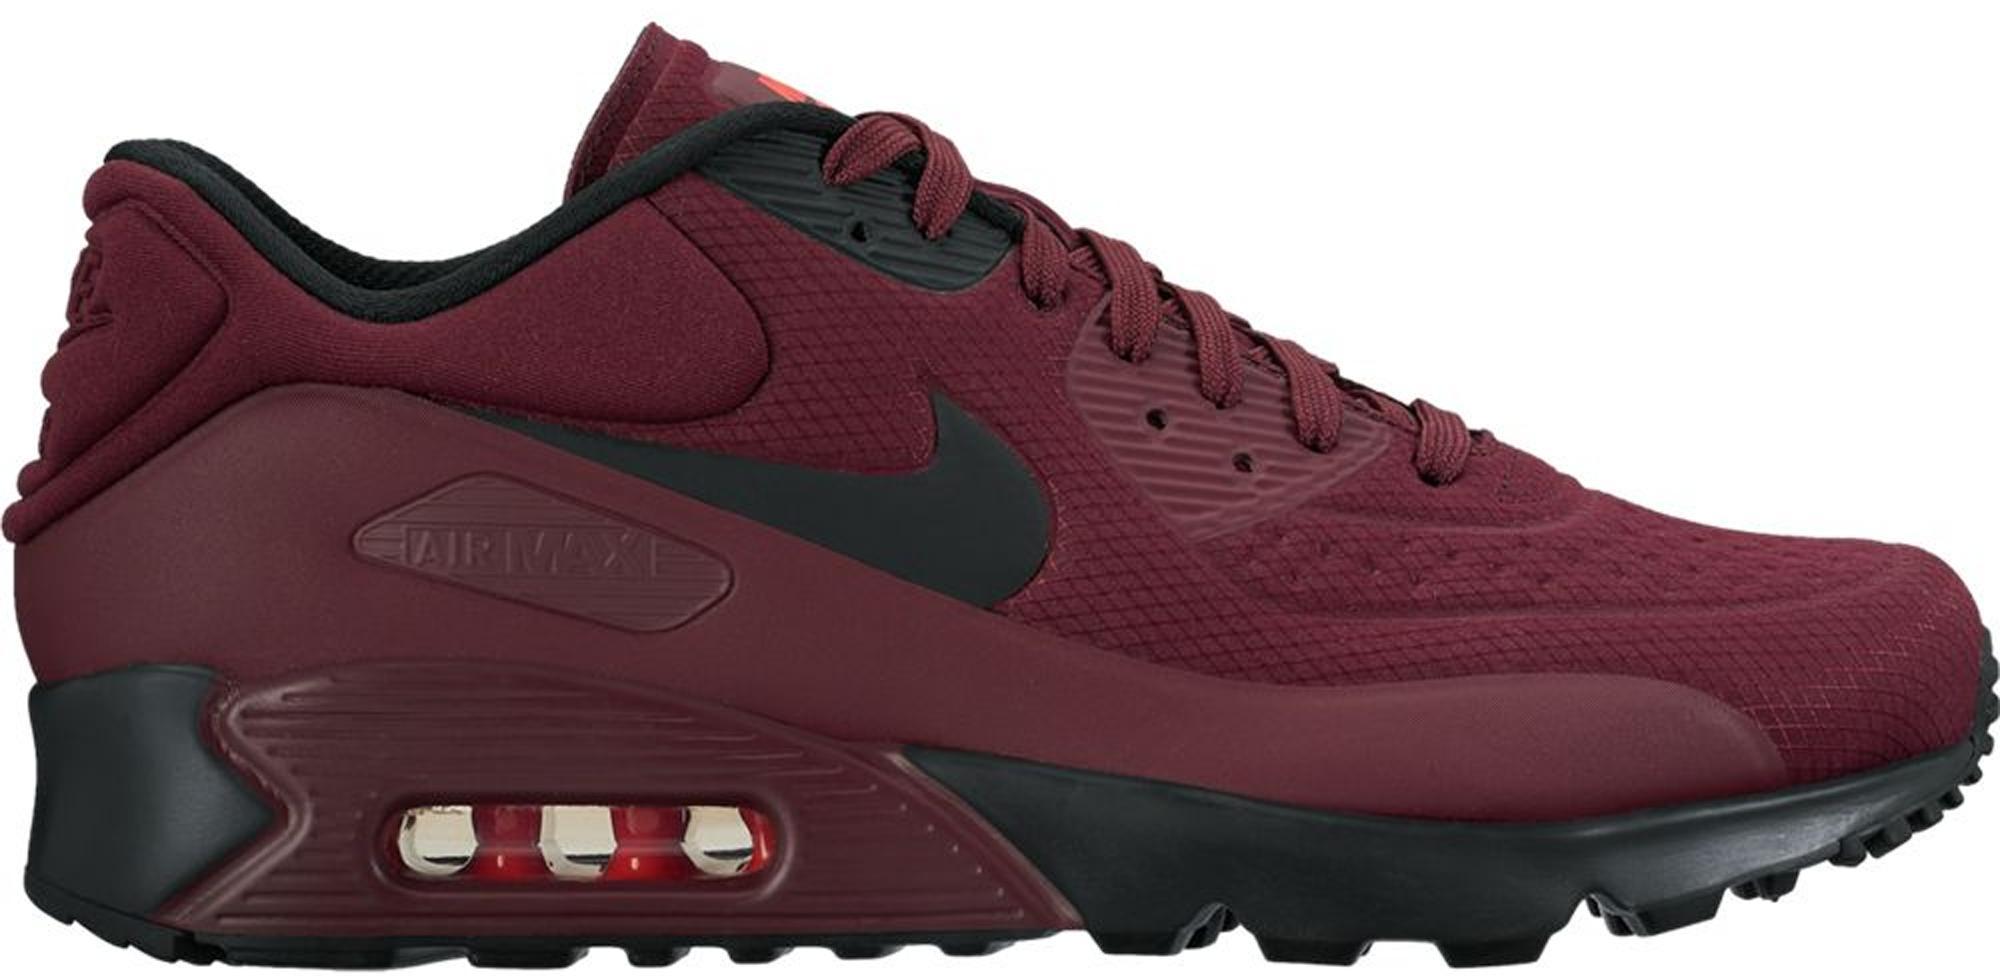 Nike Air Max 90 Ultra Bordeaux in